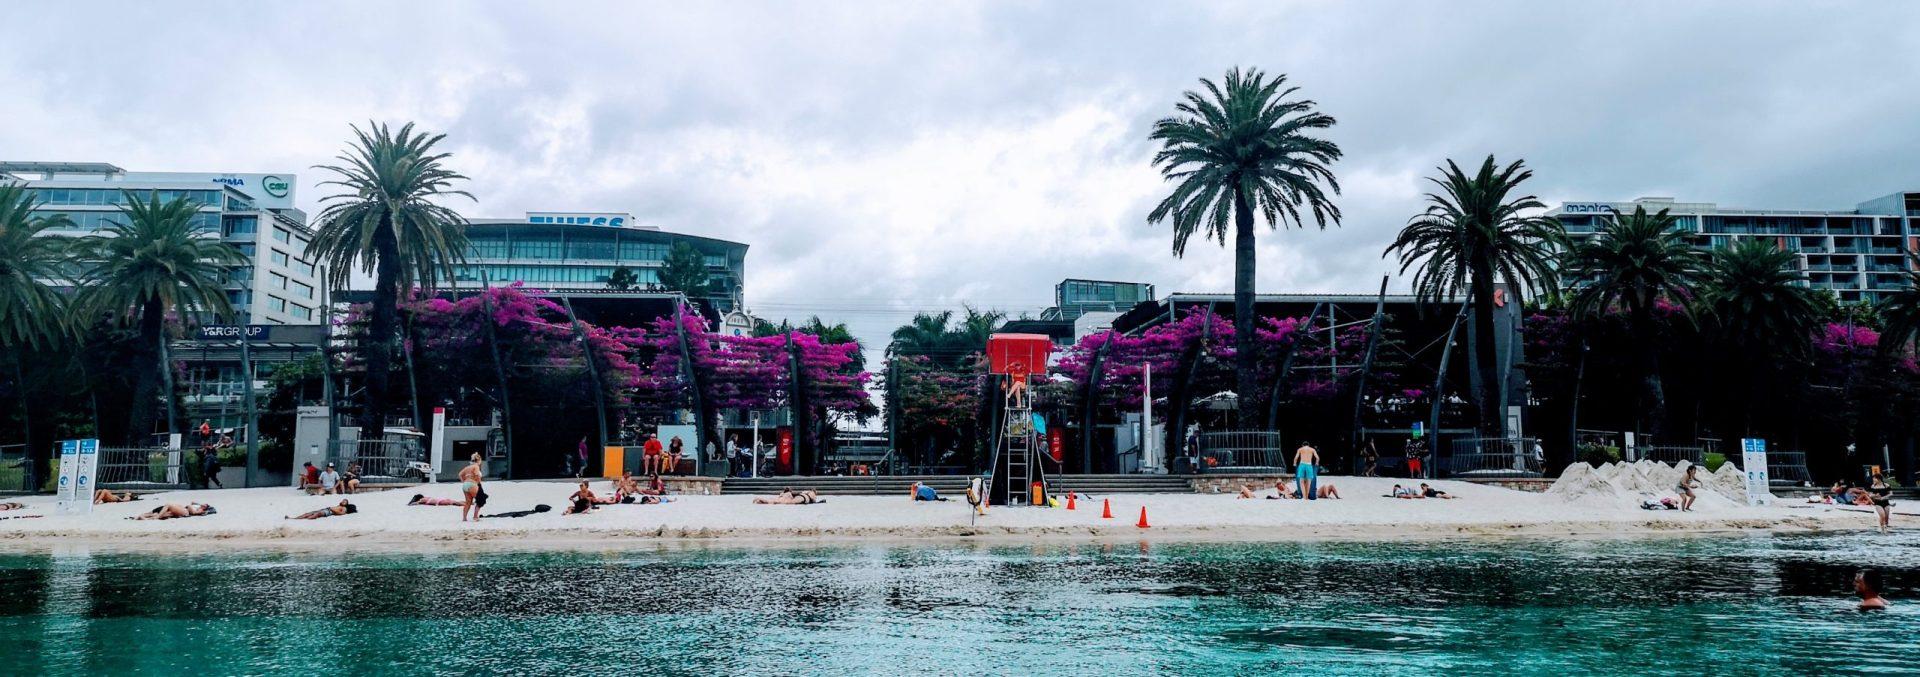 Brisbane beach park